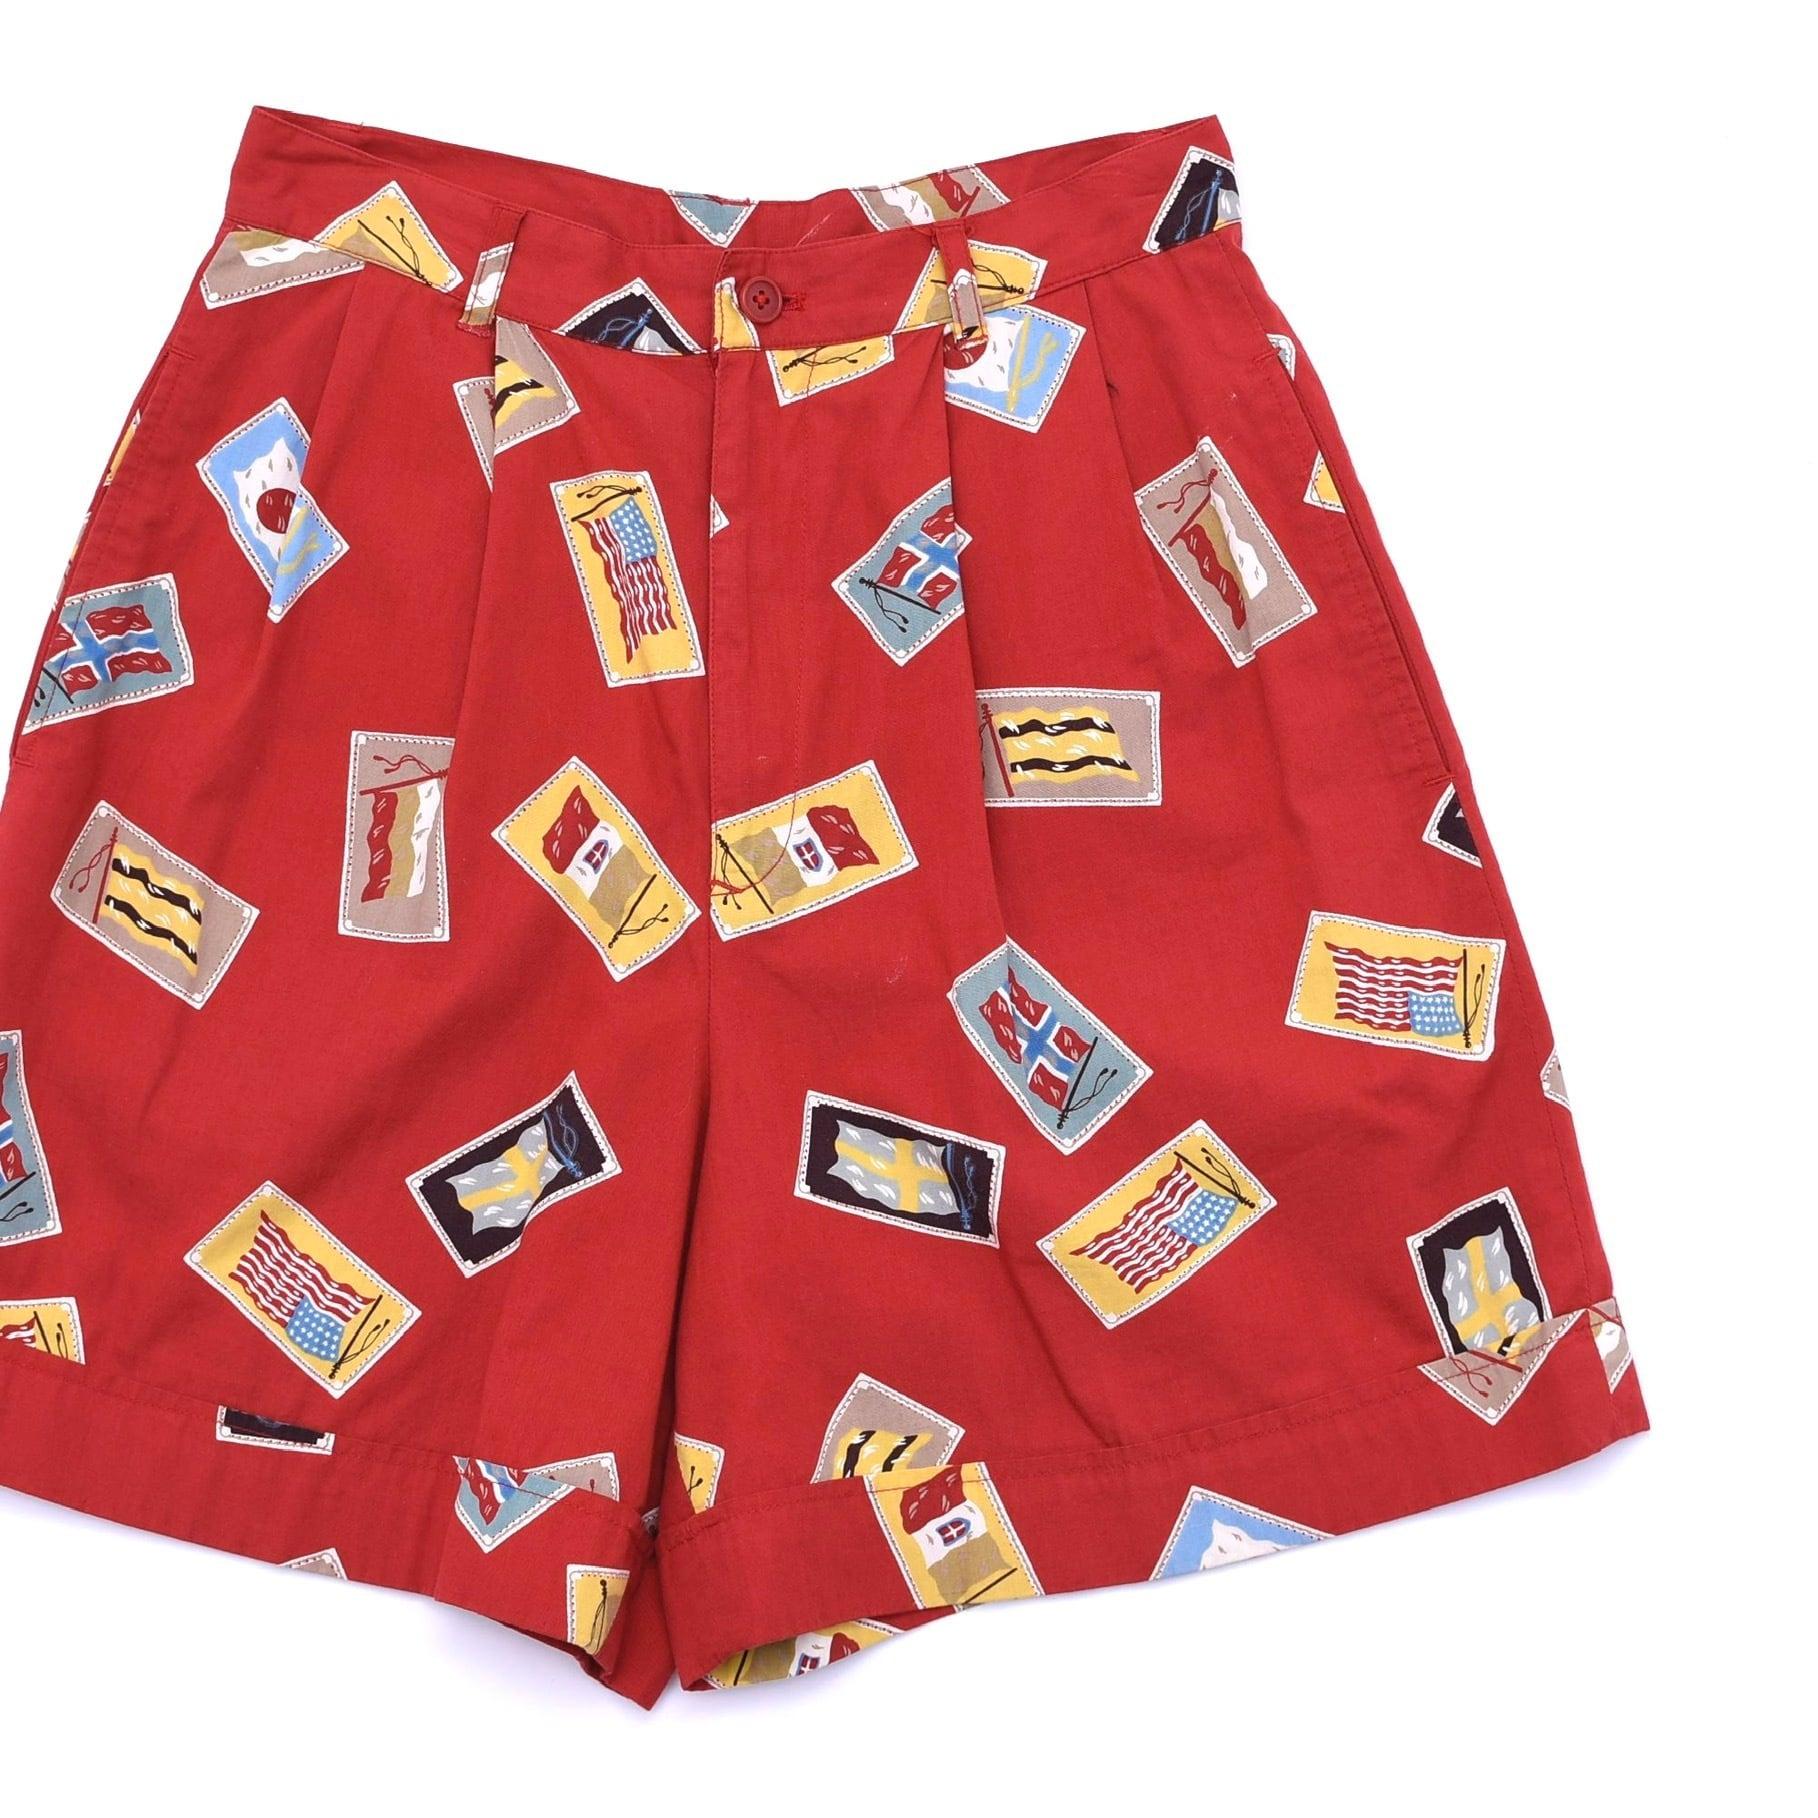 Japan vtg 80's PINK HOUSE retro shorts